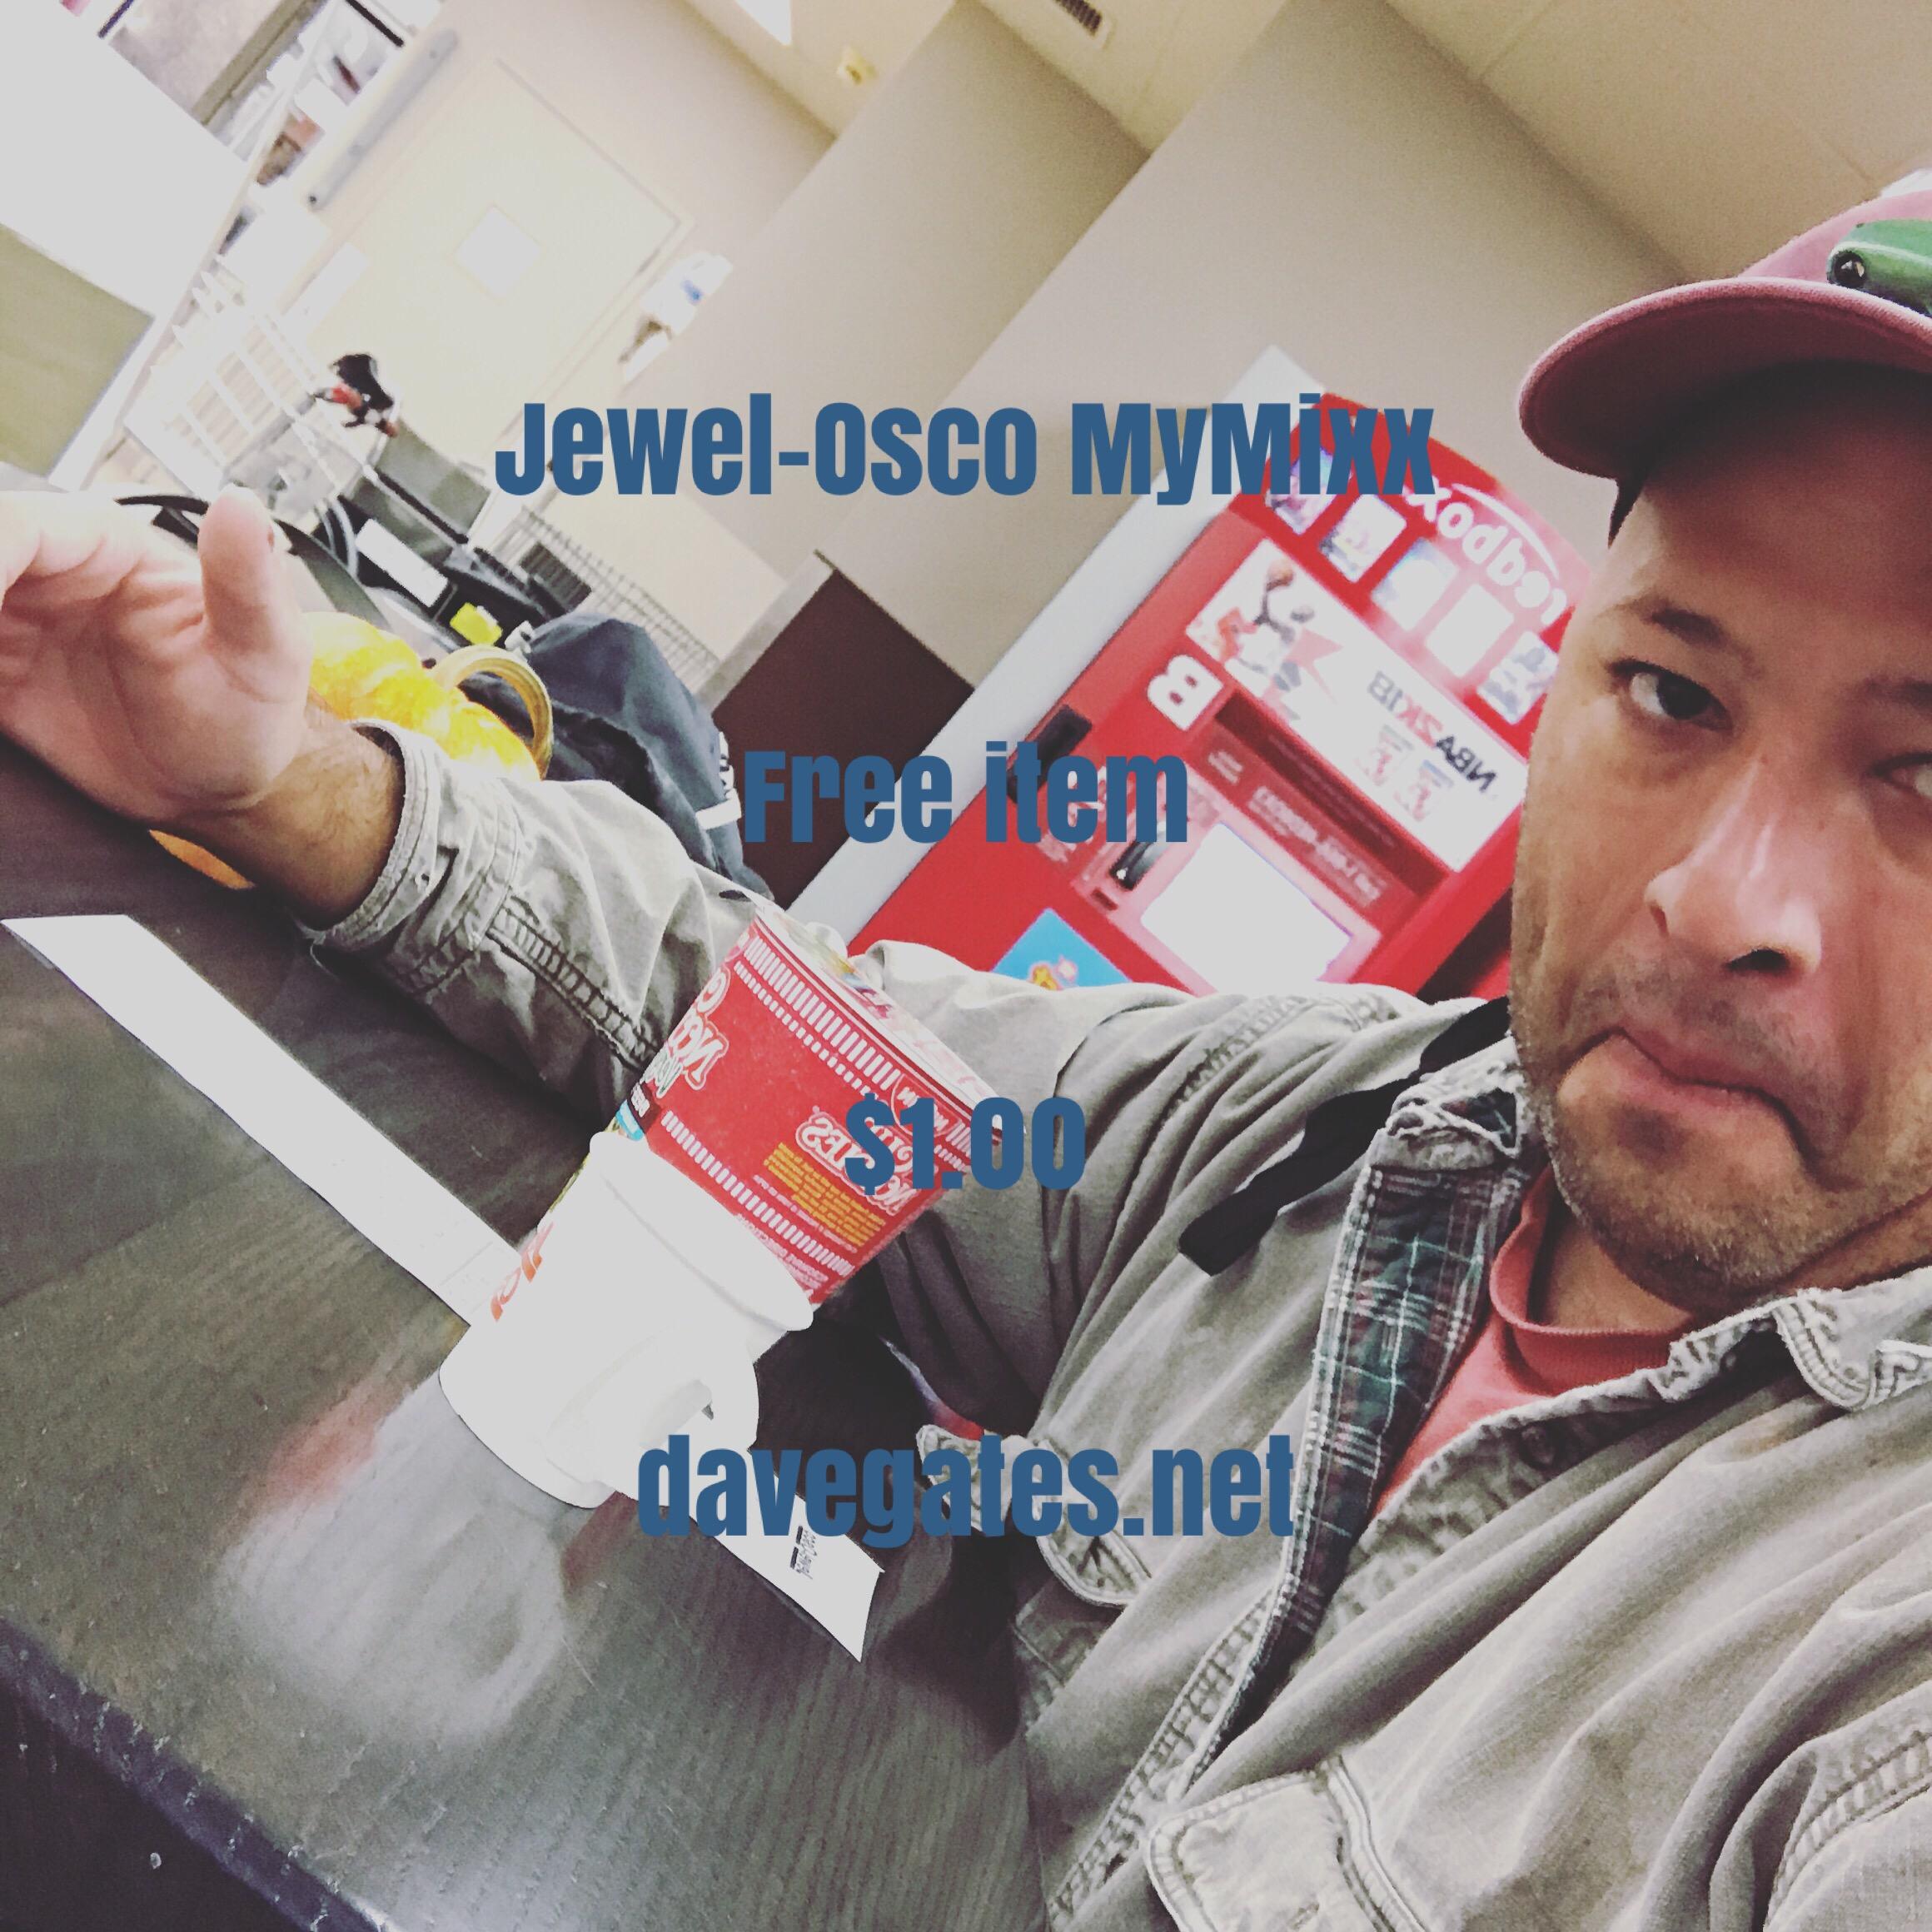 Saturday Morning Sampler Jewel-Osco – September 30, 2017